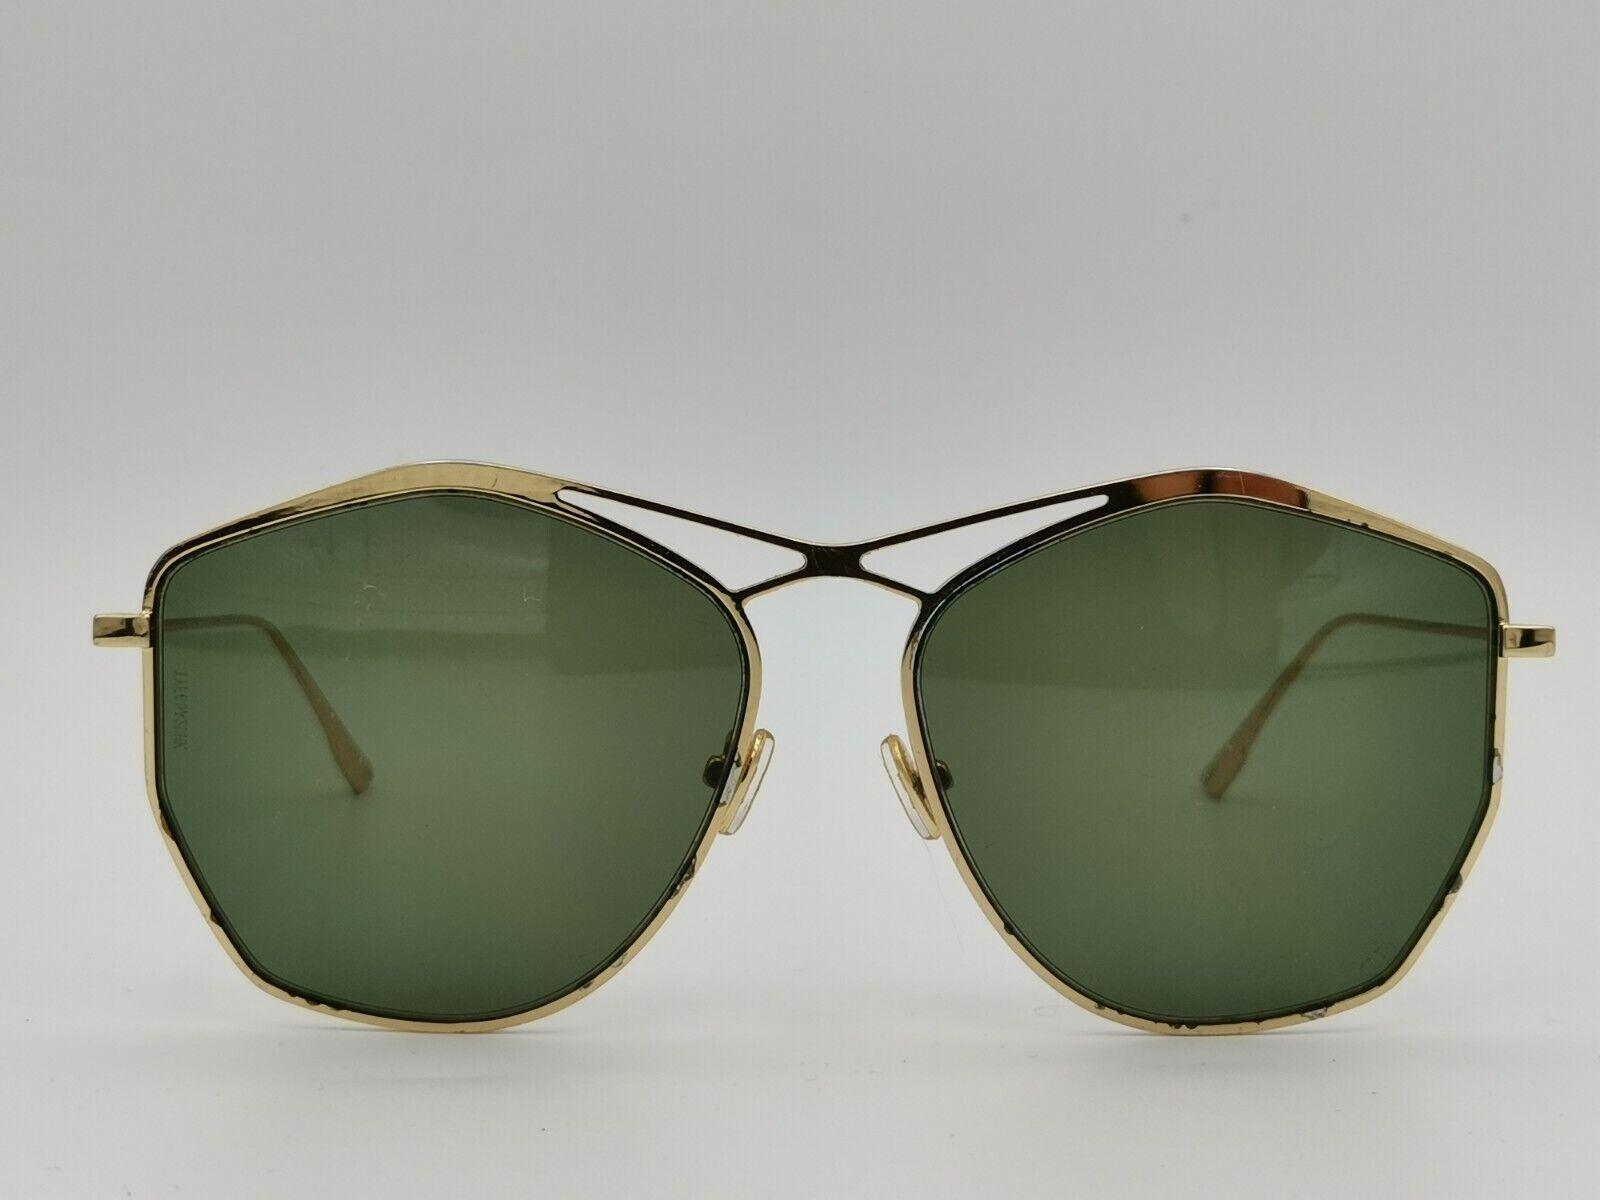 Christian Dior DIOR STELLAIRE 4 Sunglasses Gold Metal Thin